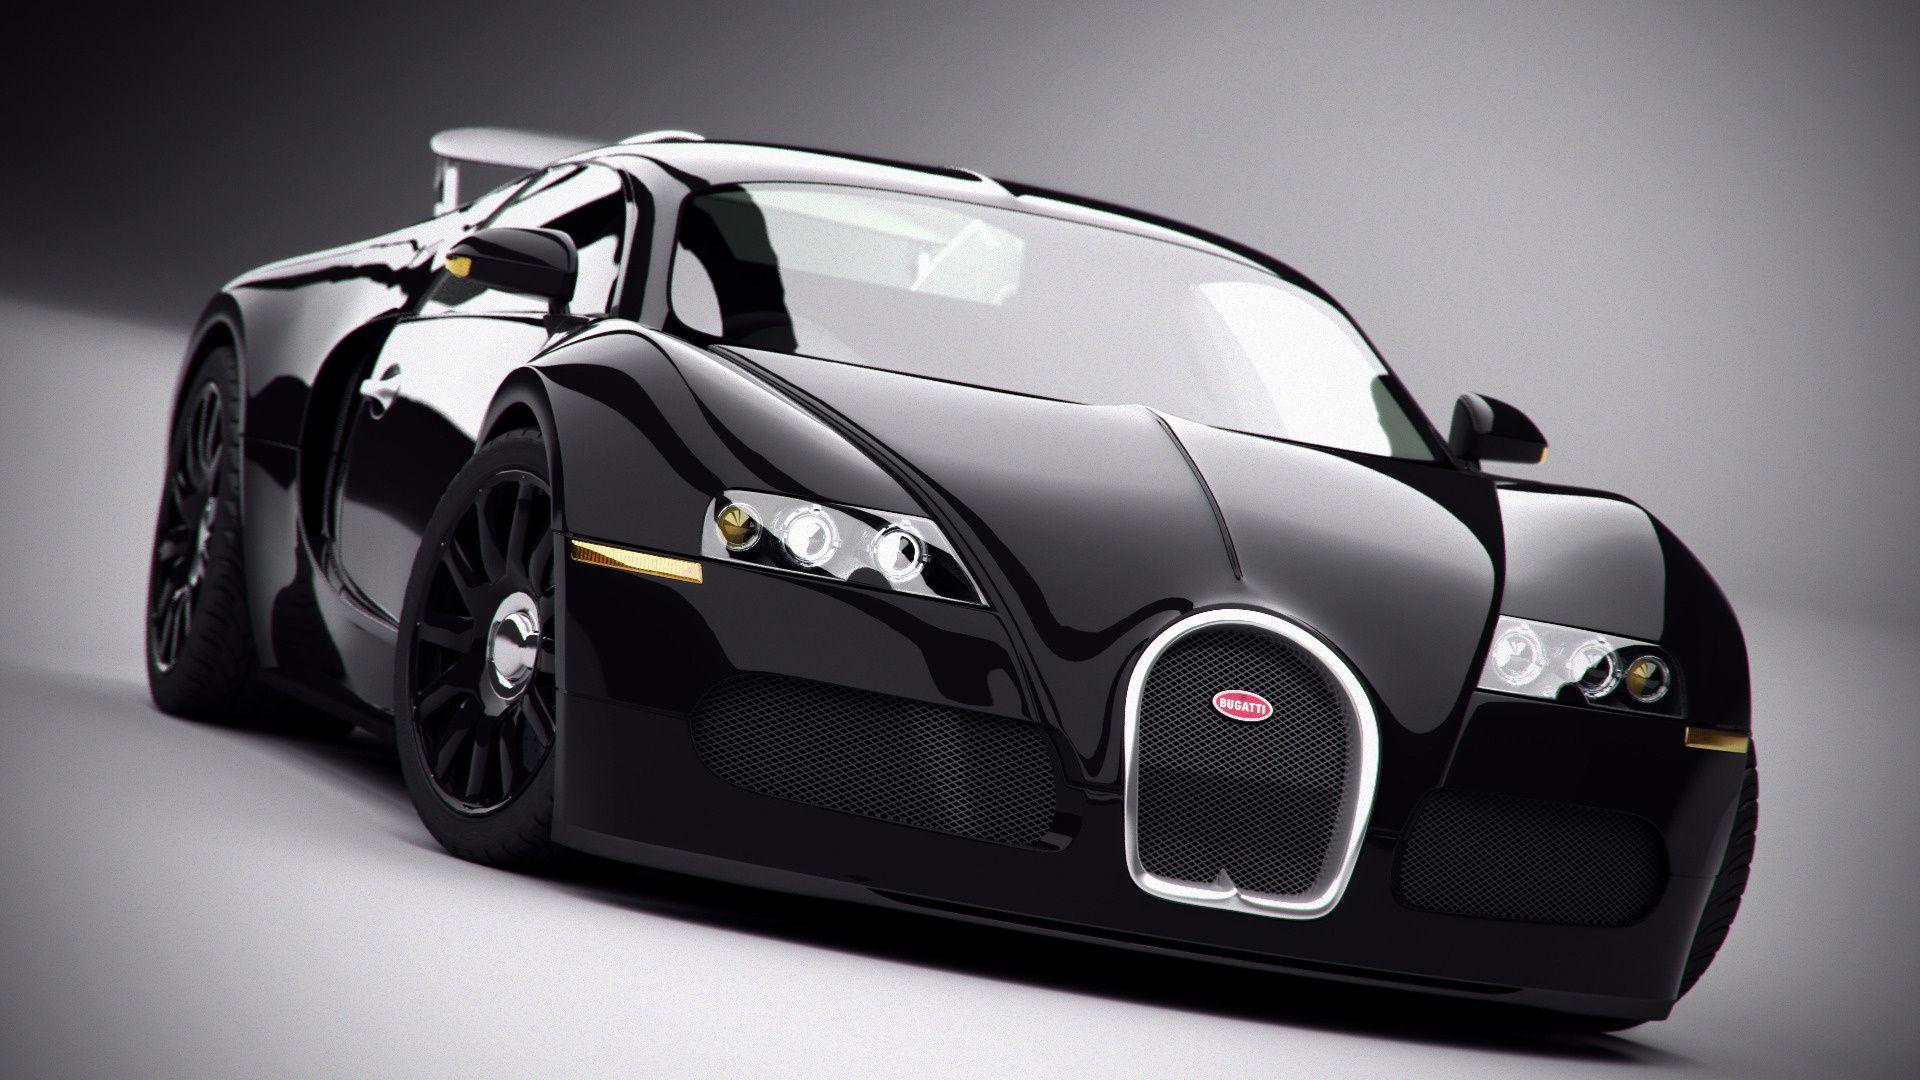 0223-Bugatti-Veyron Exciting Bugatti Veyron New Model 2015 Cars Trend